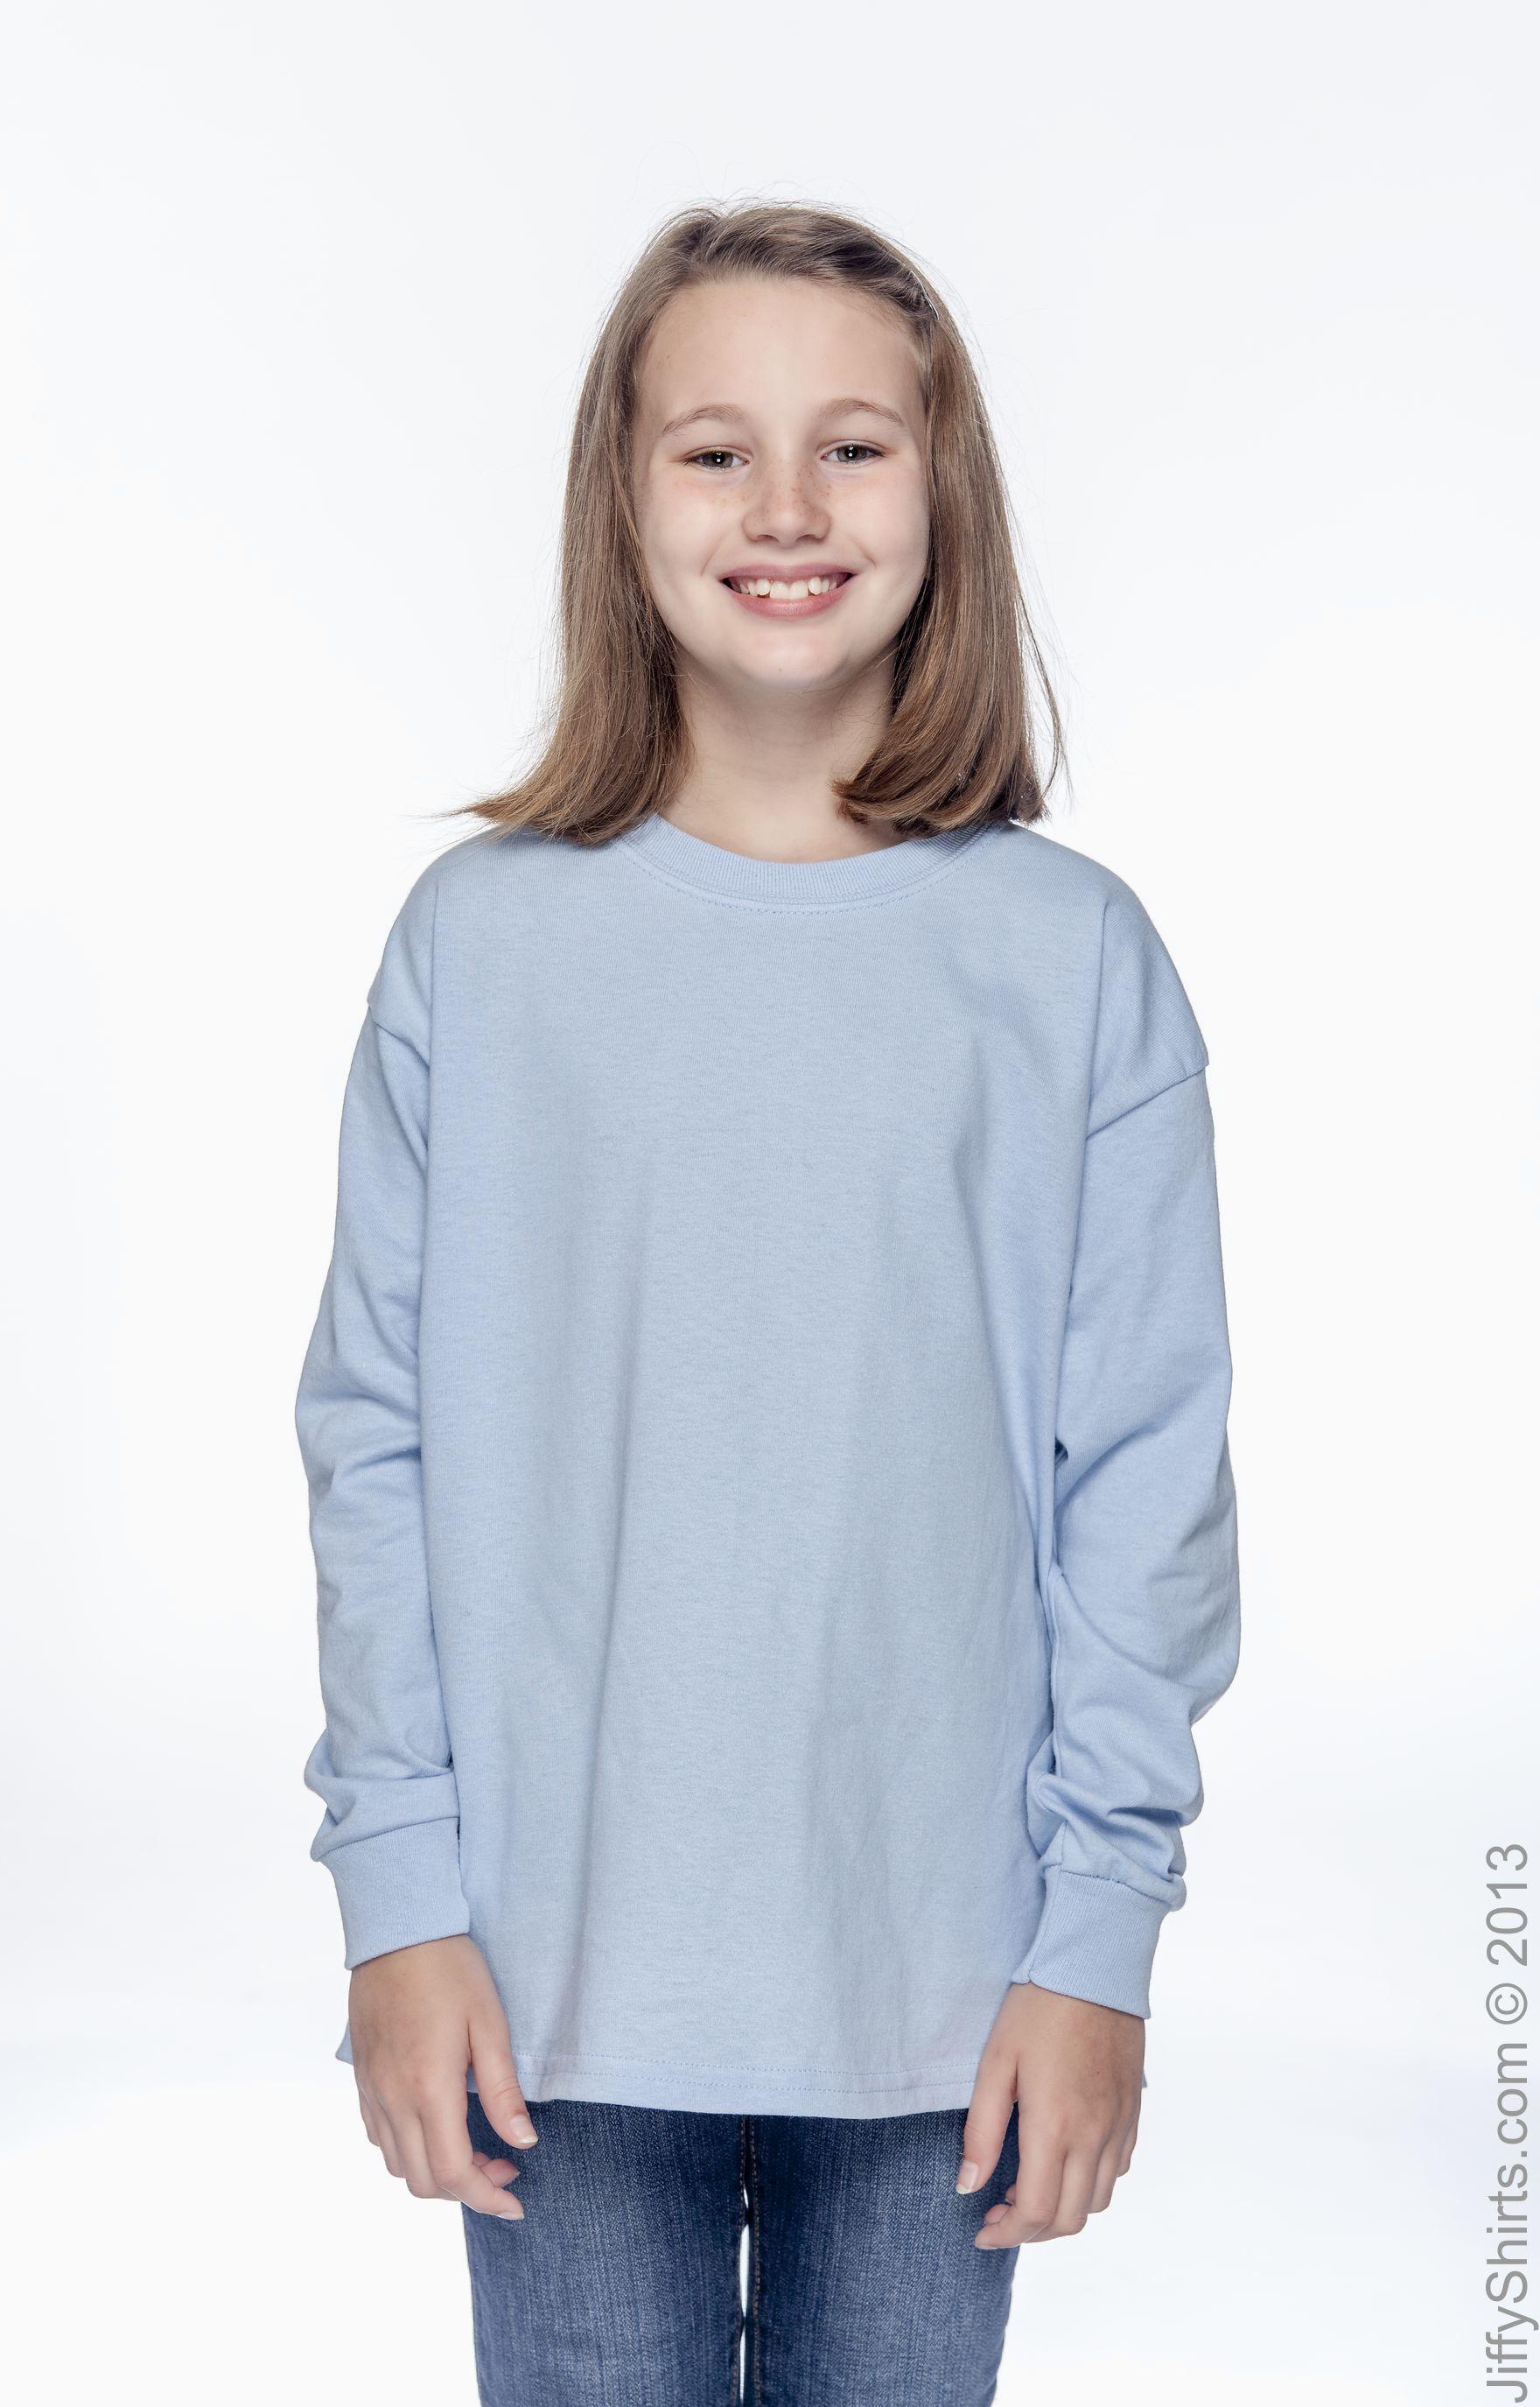 Long-Sleeve T-Shirt G240B - ASH GREY,M Gildan Ultra Cotton Youth 6 oz